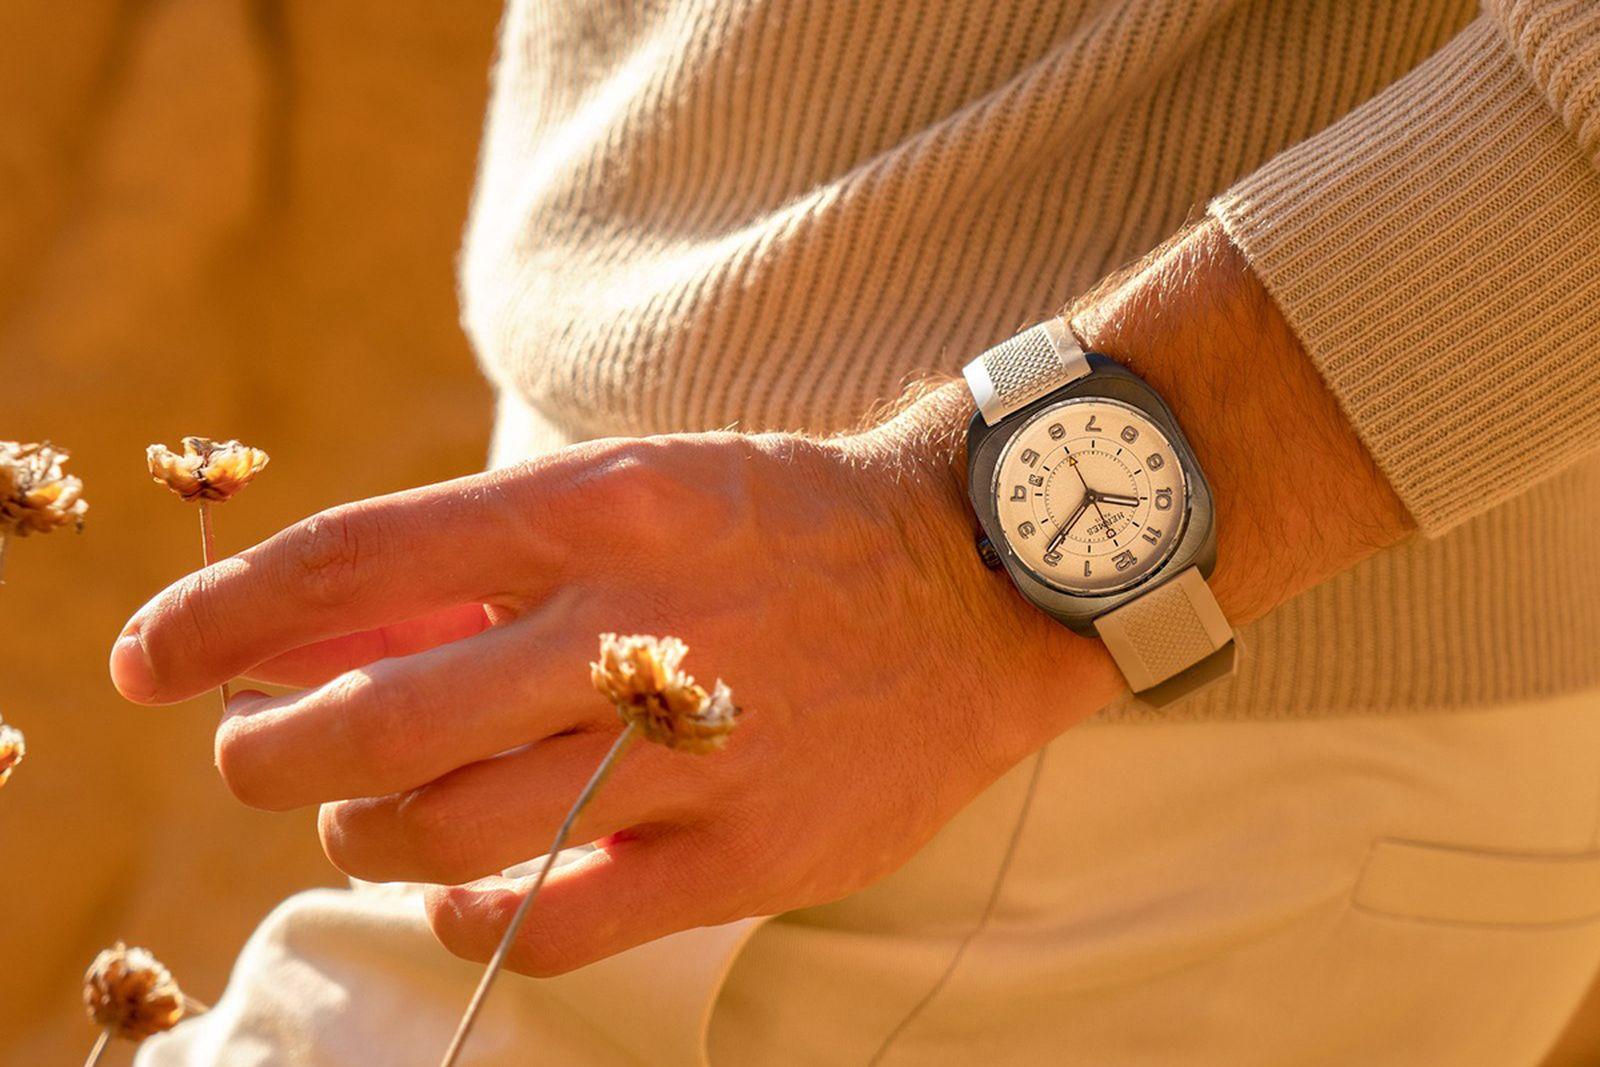 hermes-h08-hodinkee-watch (6)